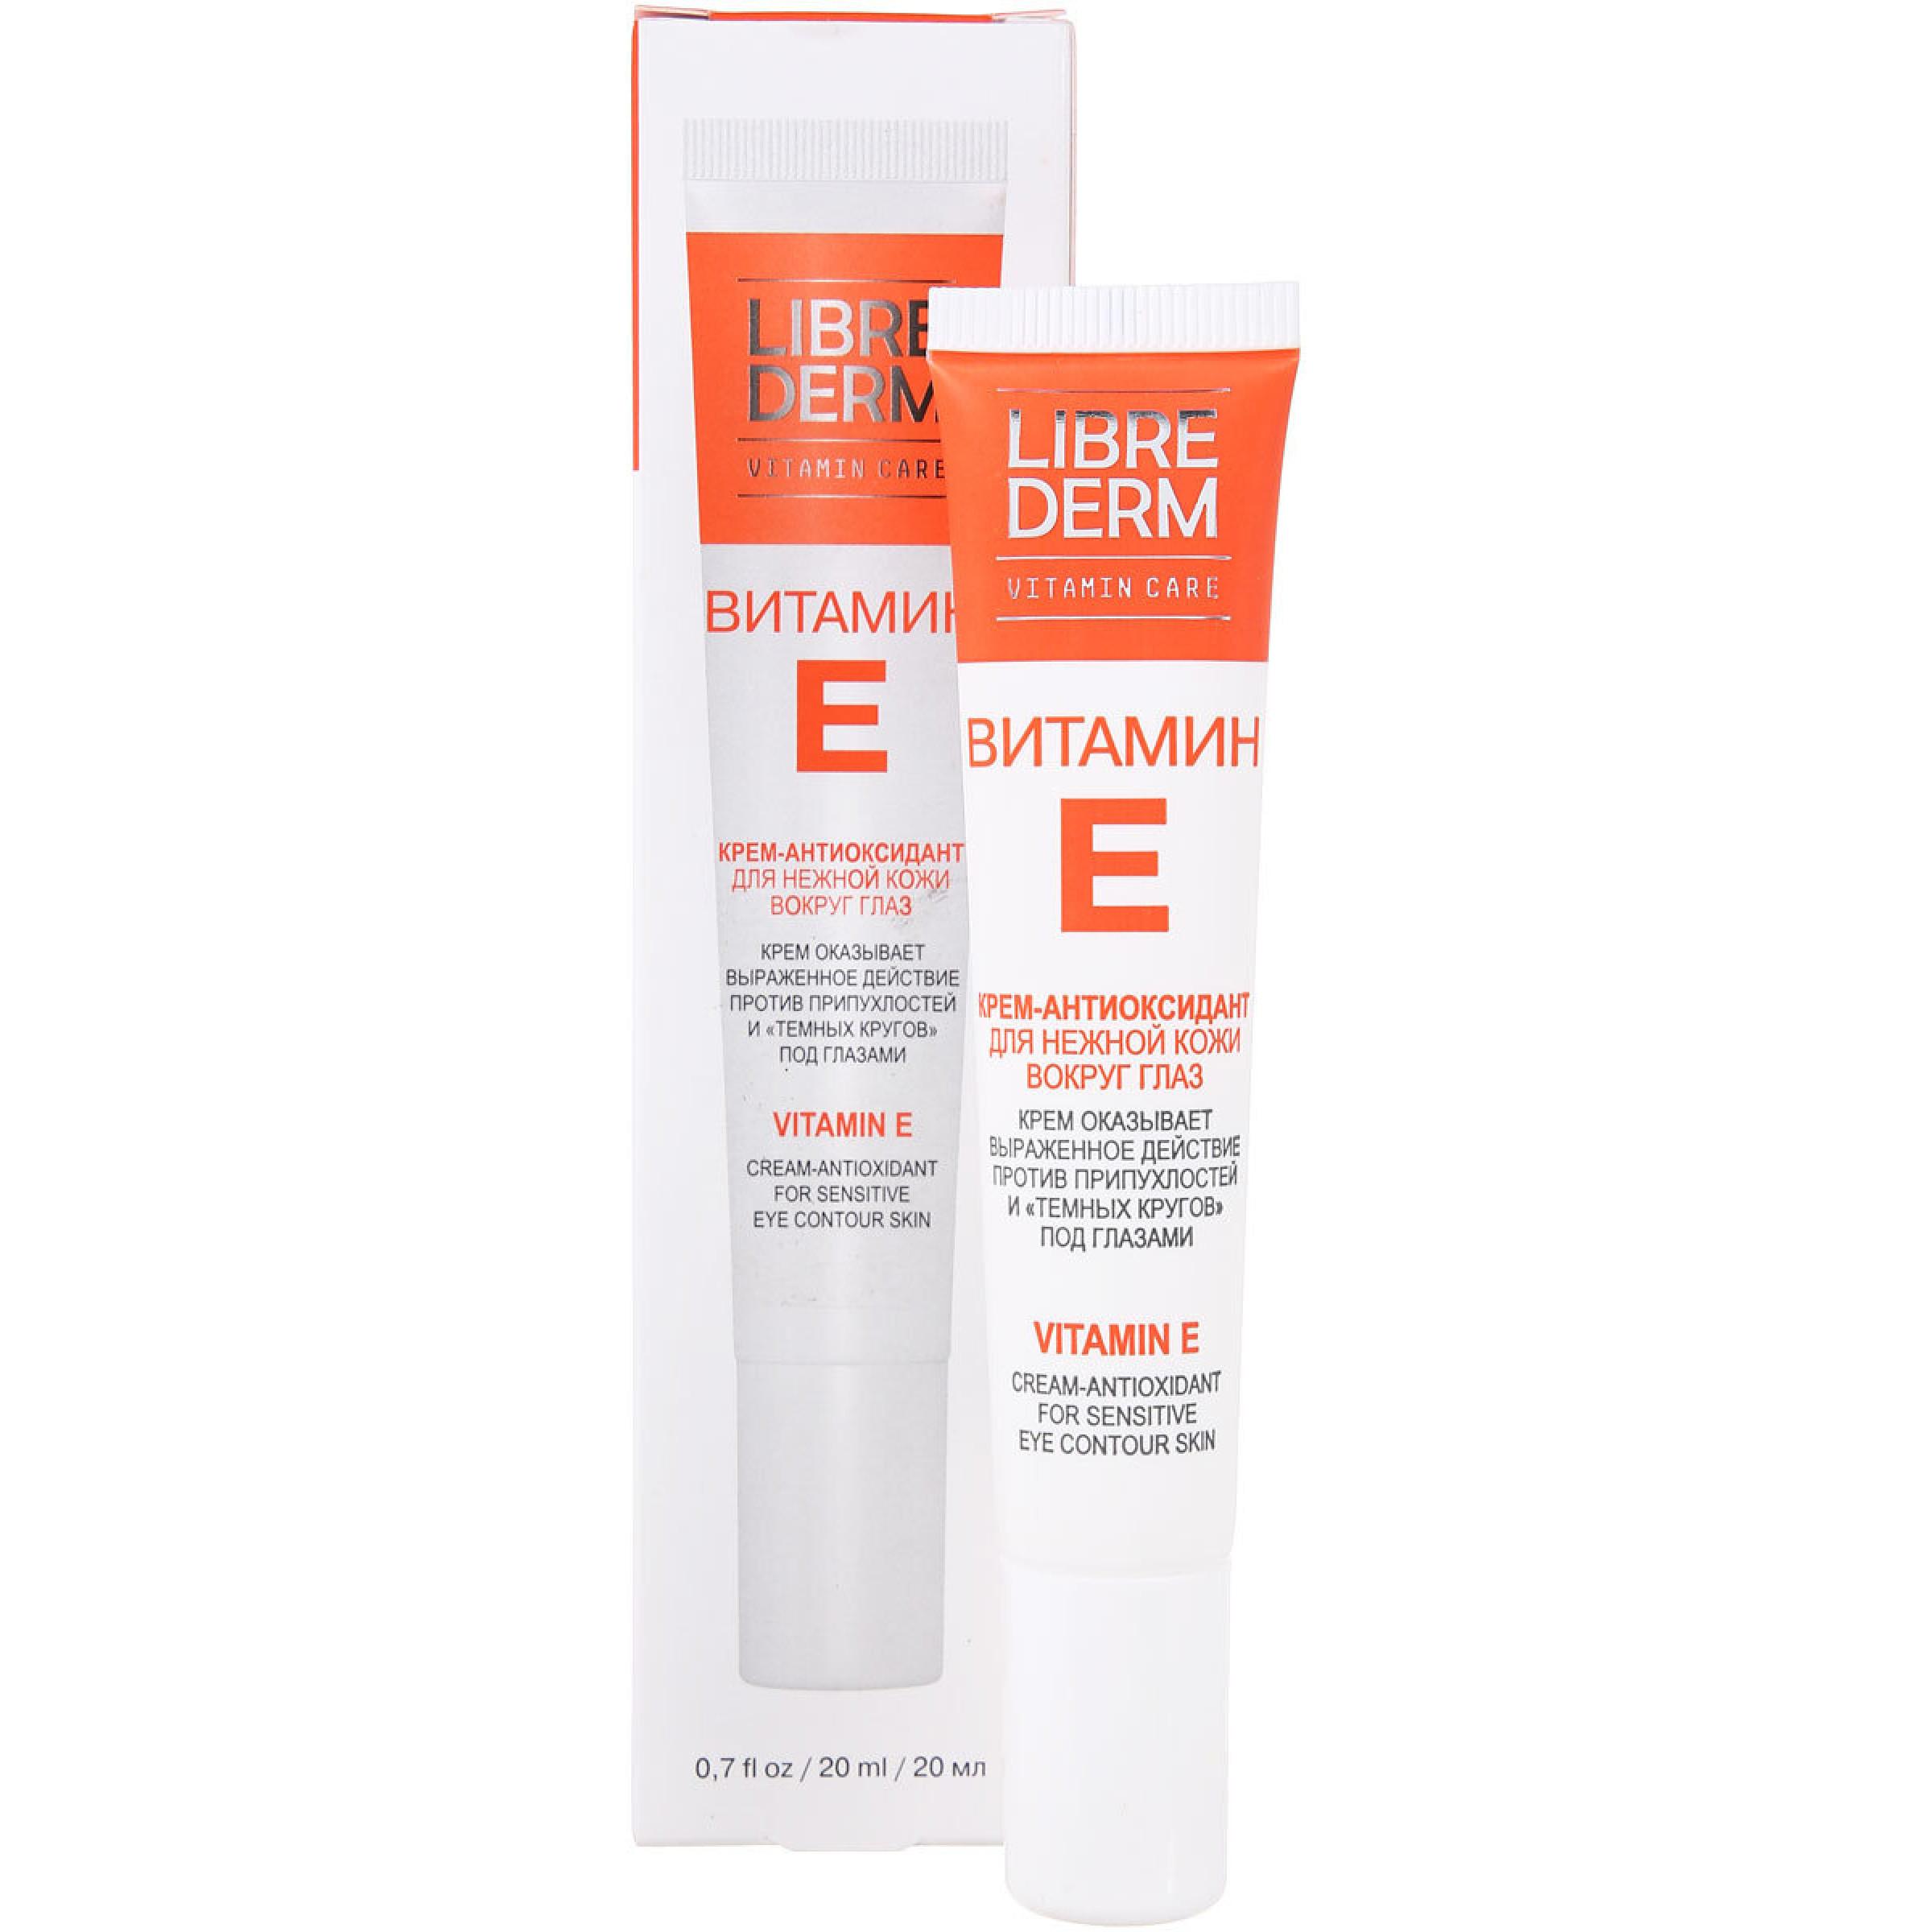 "Librederm Крем-антиоксидант для кожи вокруг глаз ""Витамин E"", 20 мл"